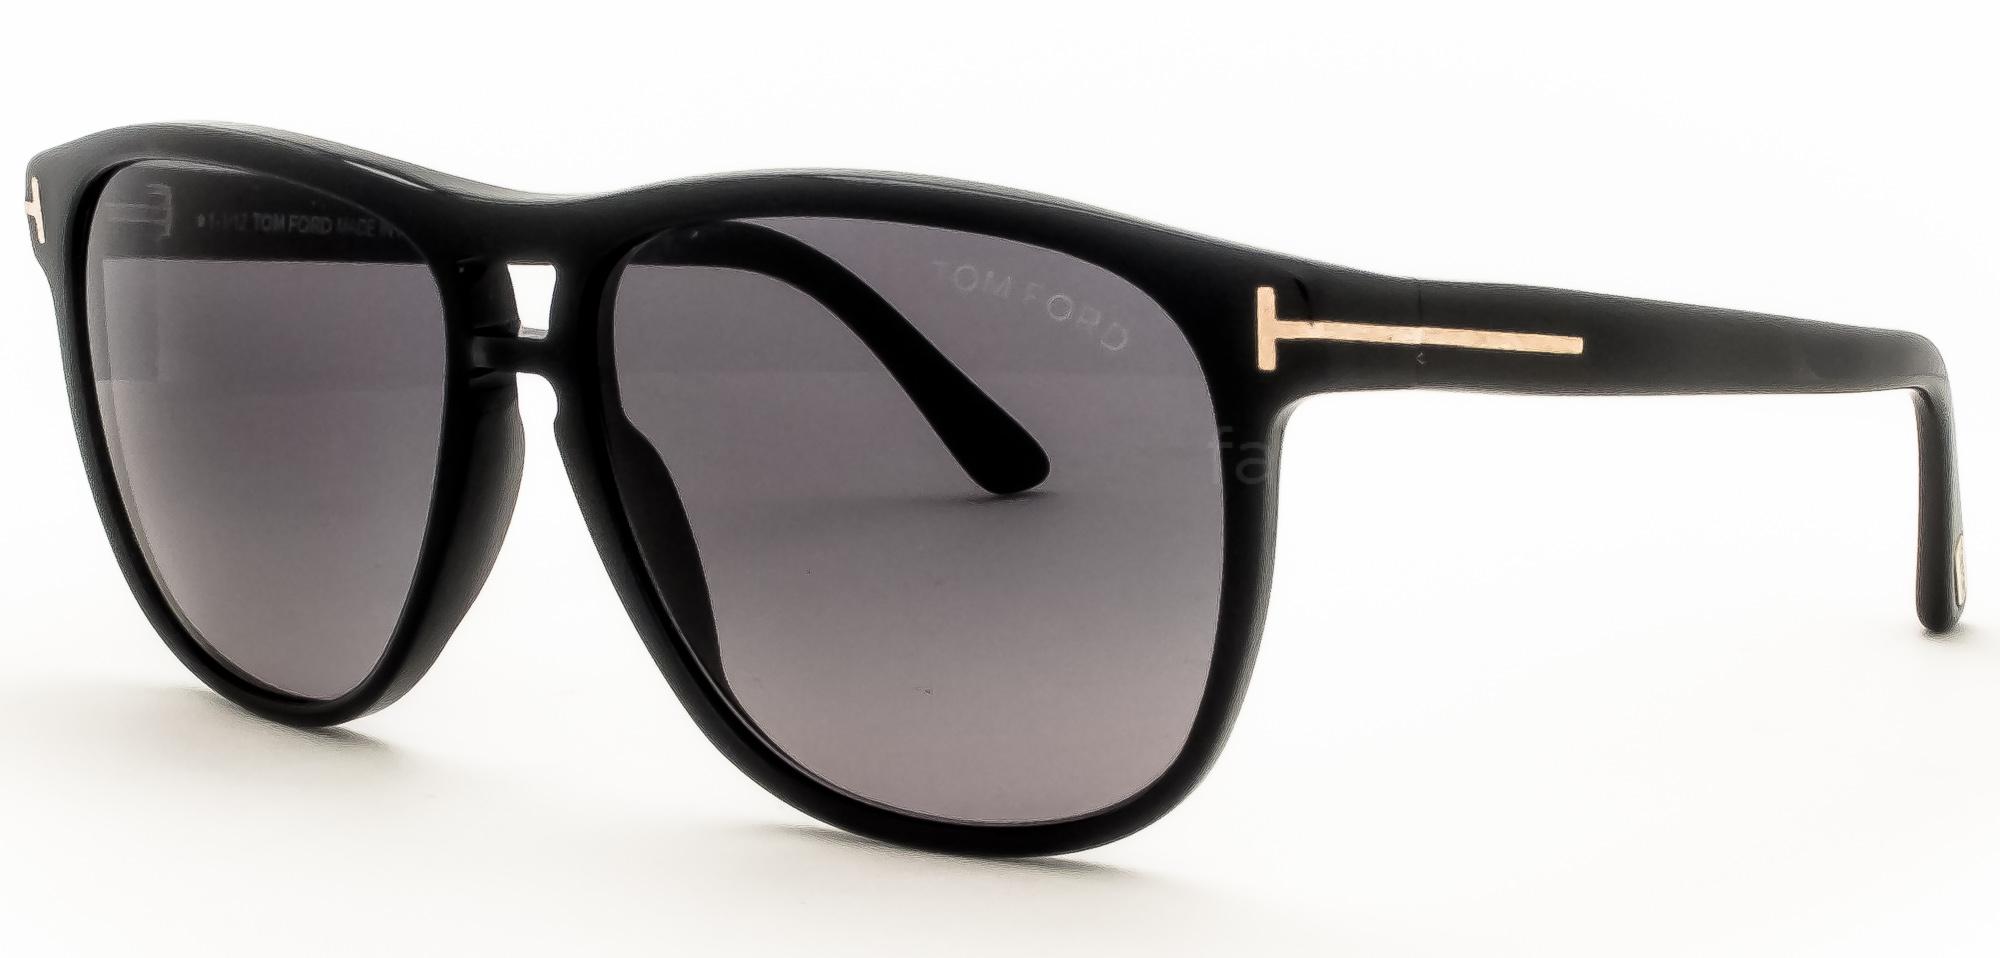 6f7574b5c2614 Tom Ford LENNON TF288 Sunglasses